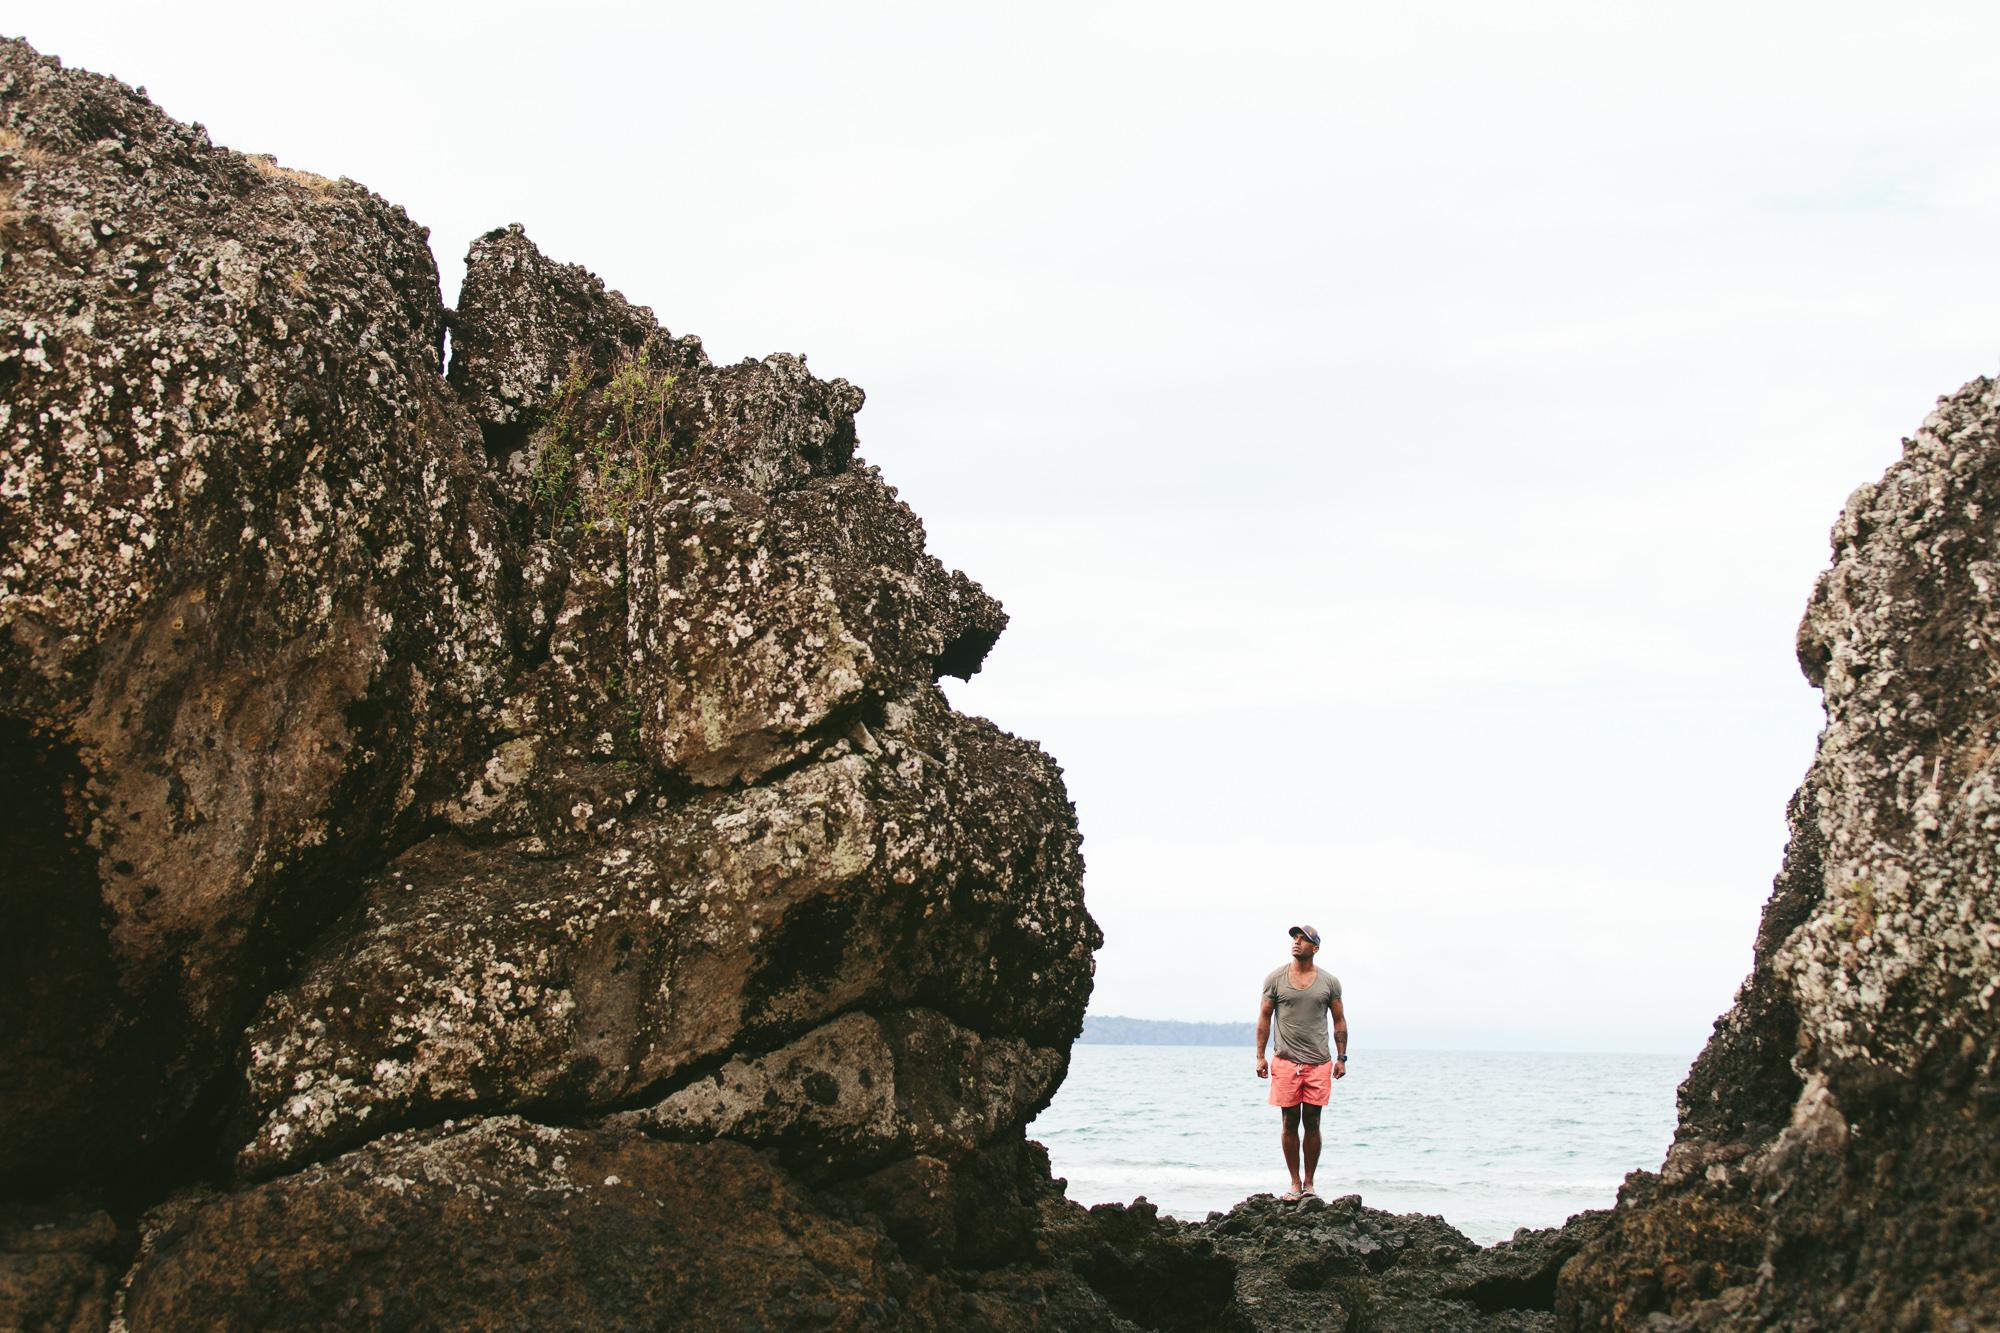 Hidden Beach Castaway Day - The Remote Resort Fiji Islands